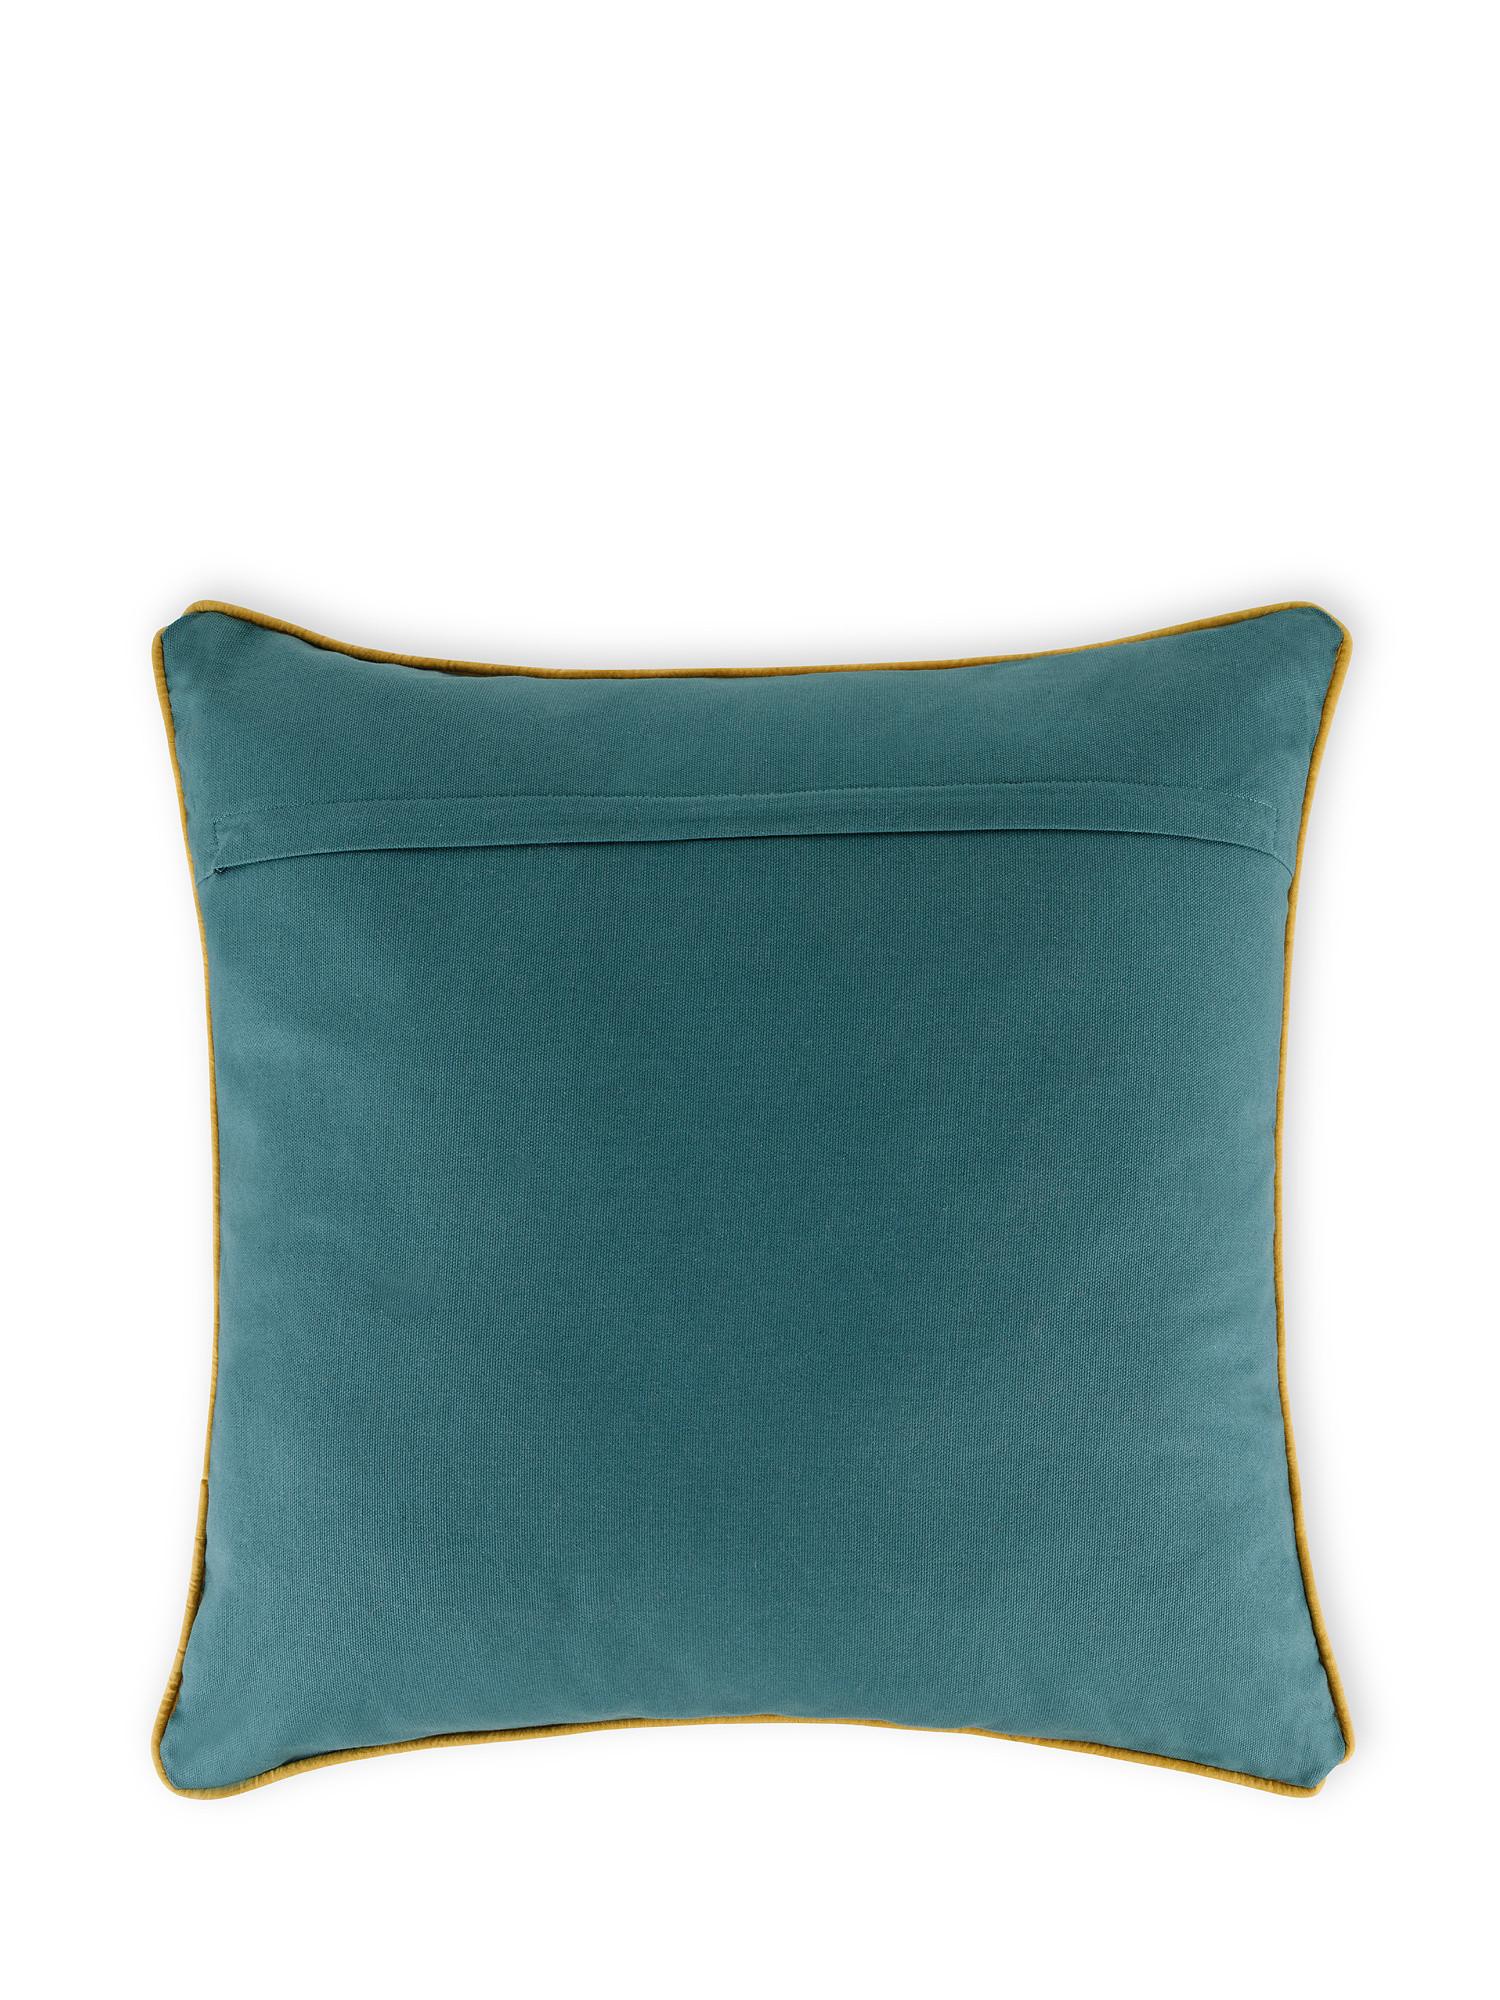 Cuscino cotone ricamo vaso 45x45cm, Multicolor, large image number 1